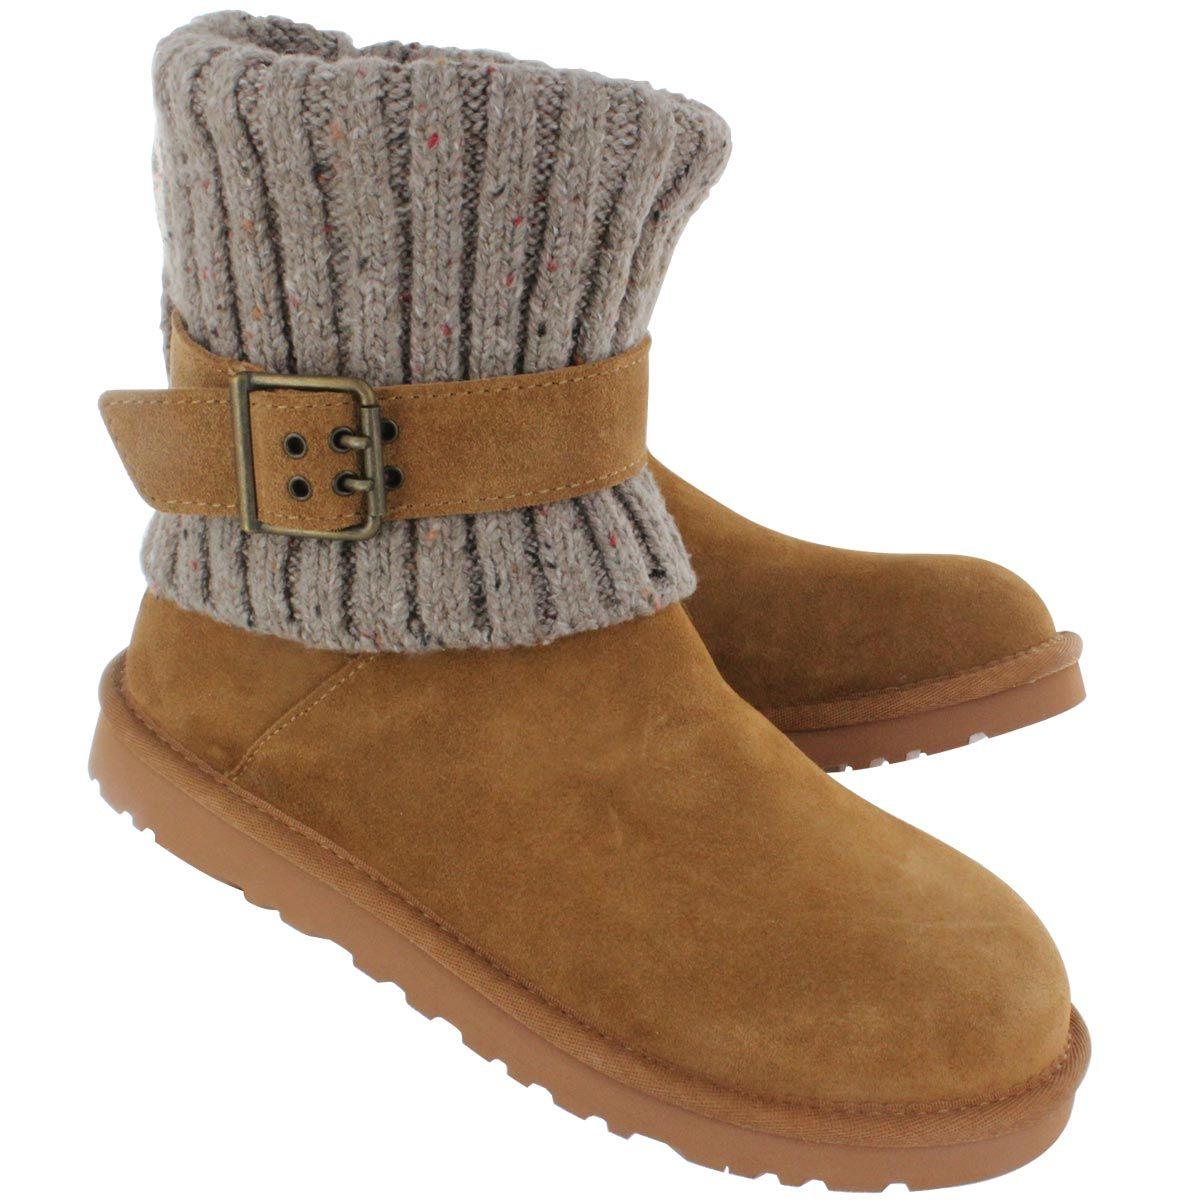 1579c014181 Ugg Boots Womens 13 | Mindwise